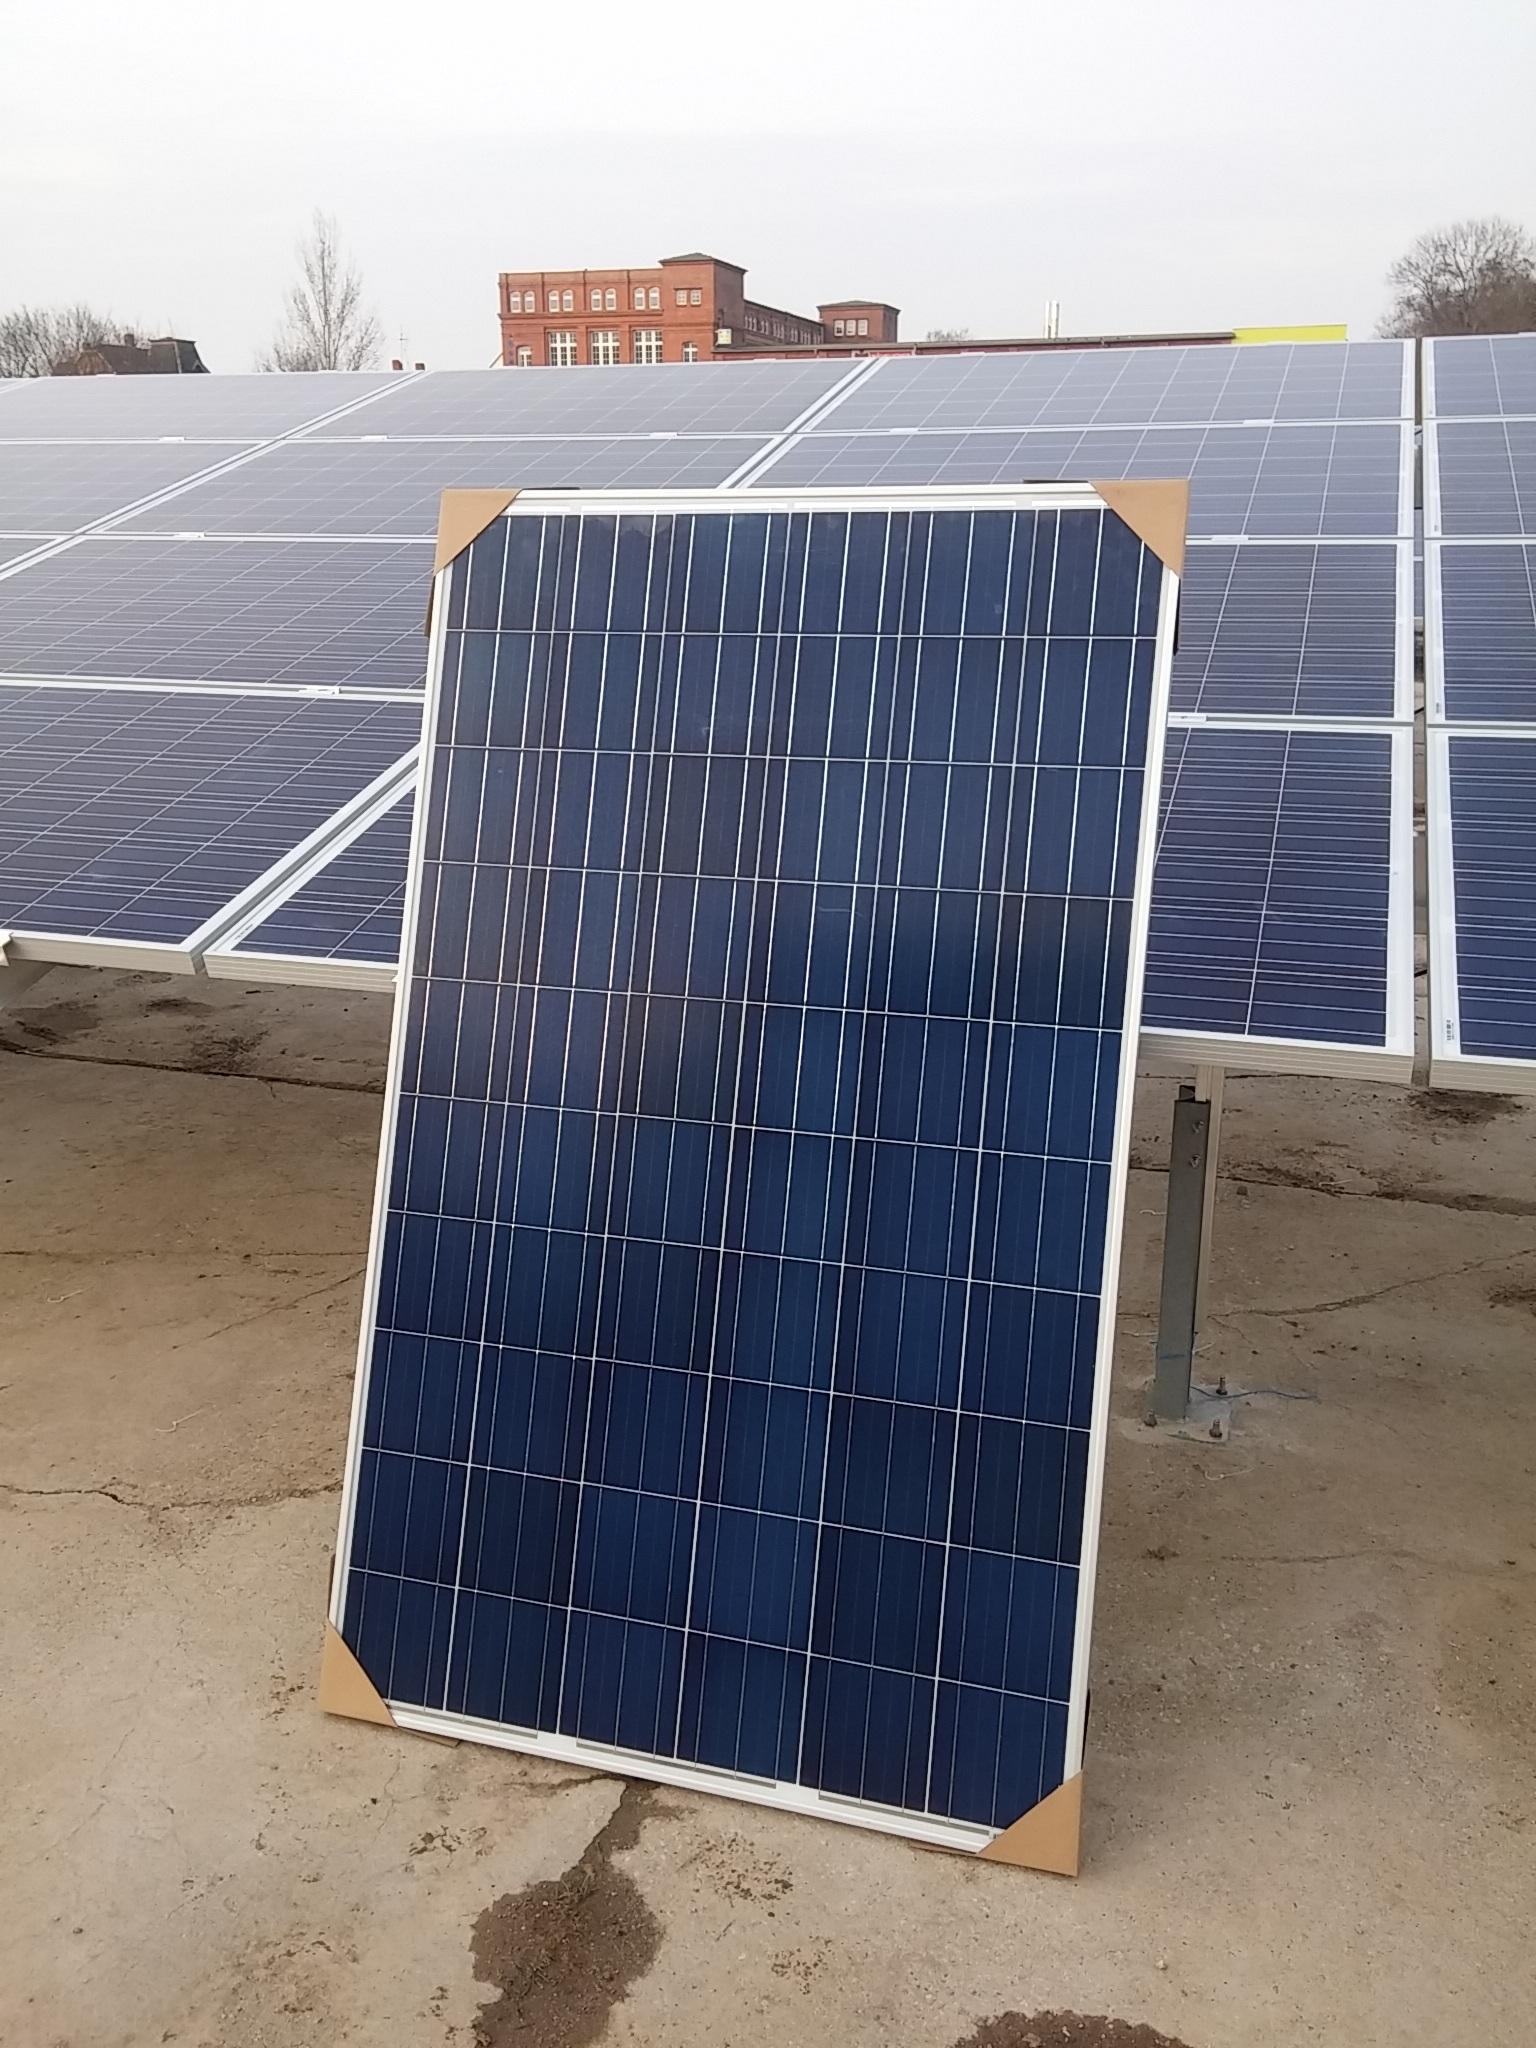 Free Images : sun, technology, blue, solar panel, current, net